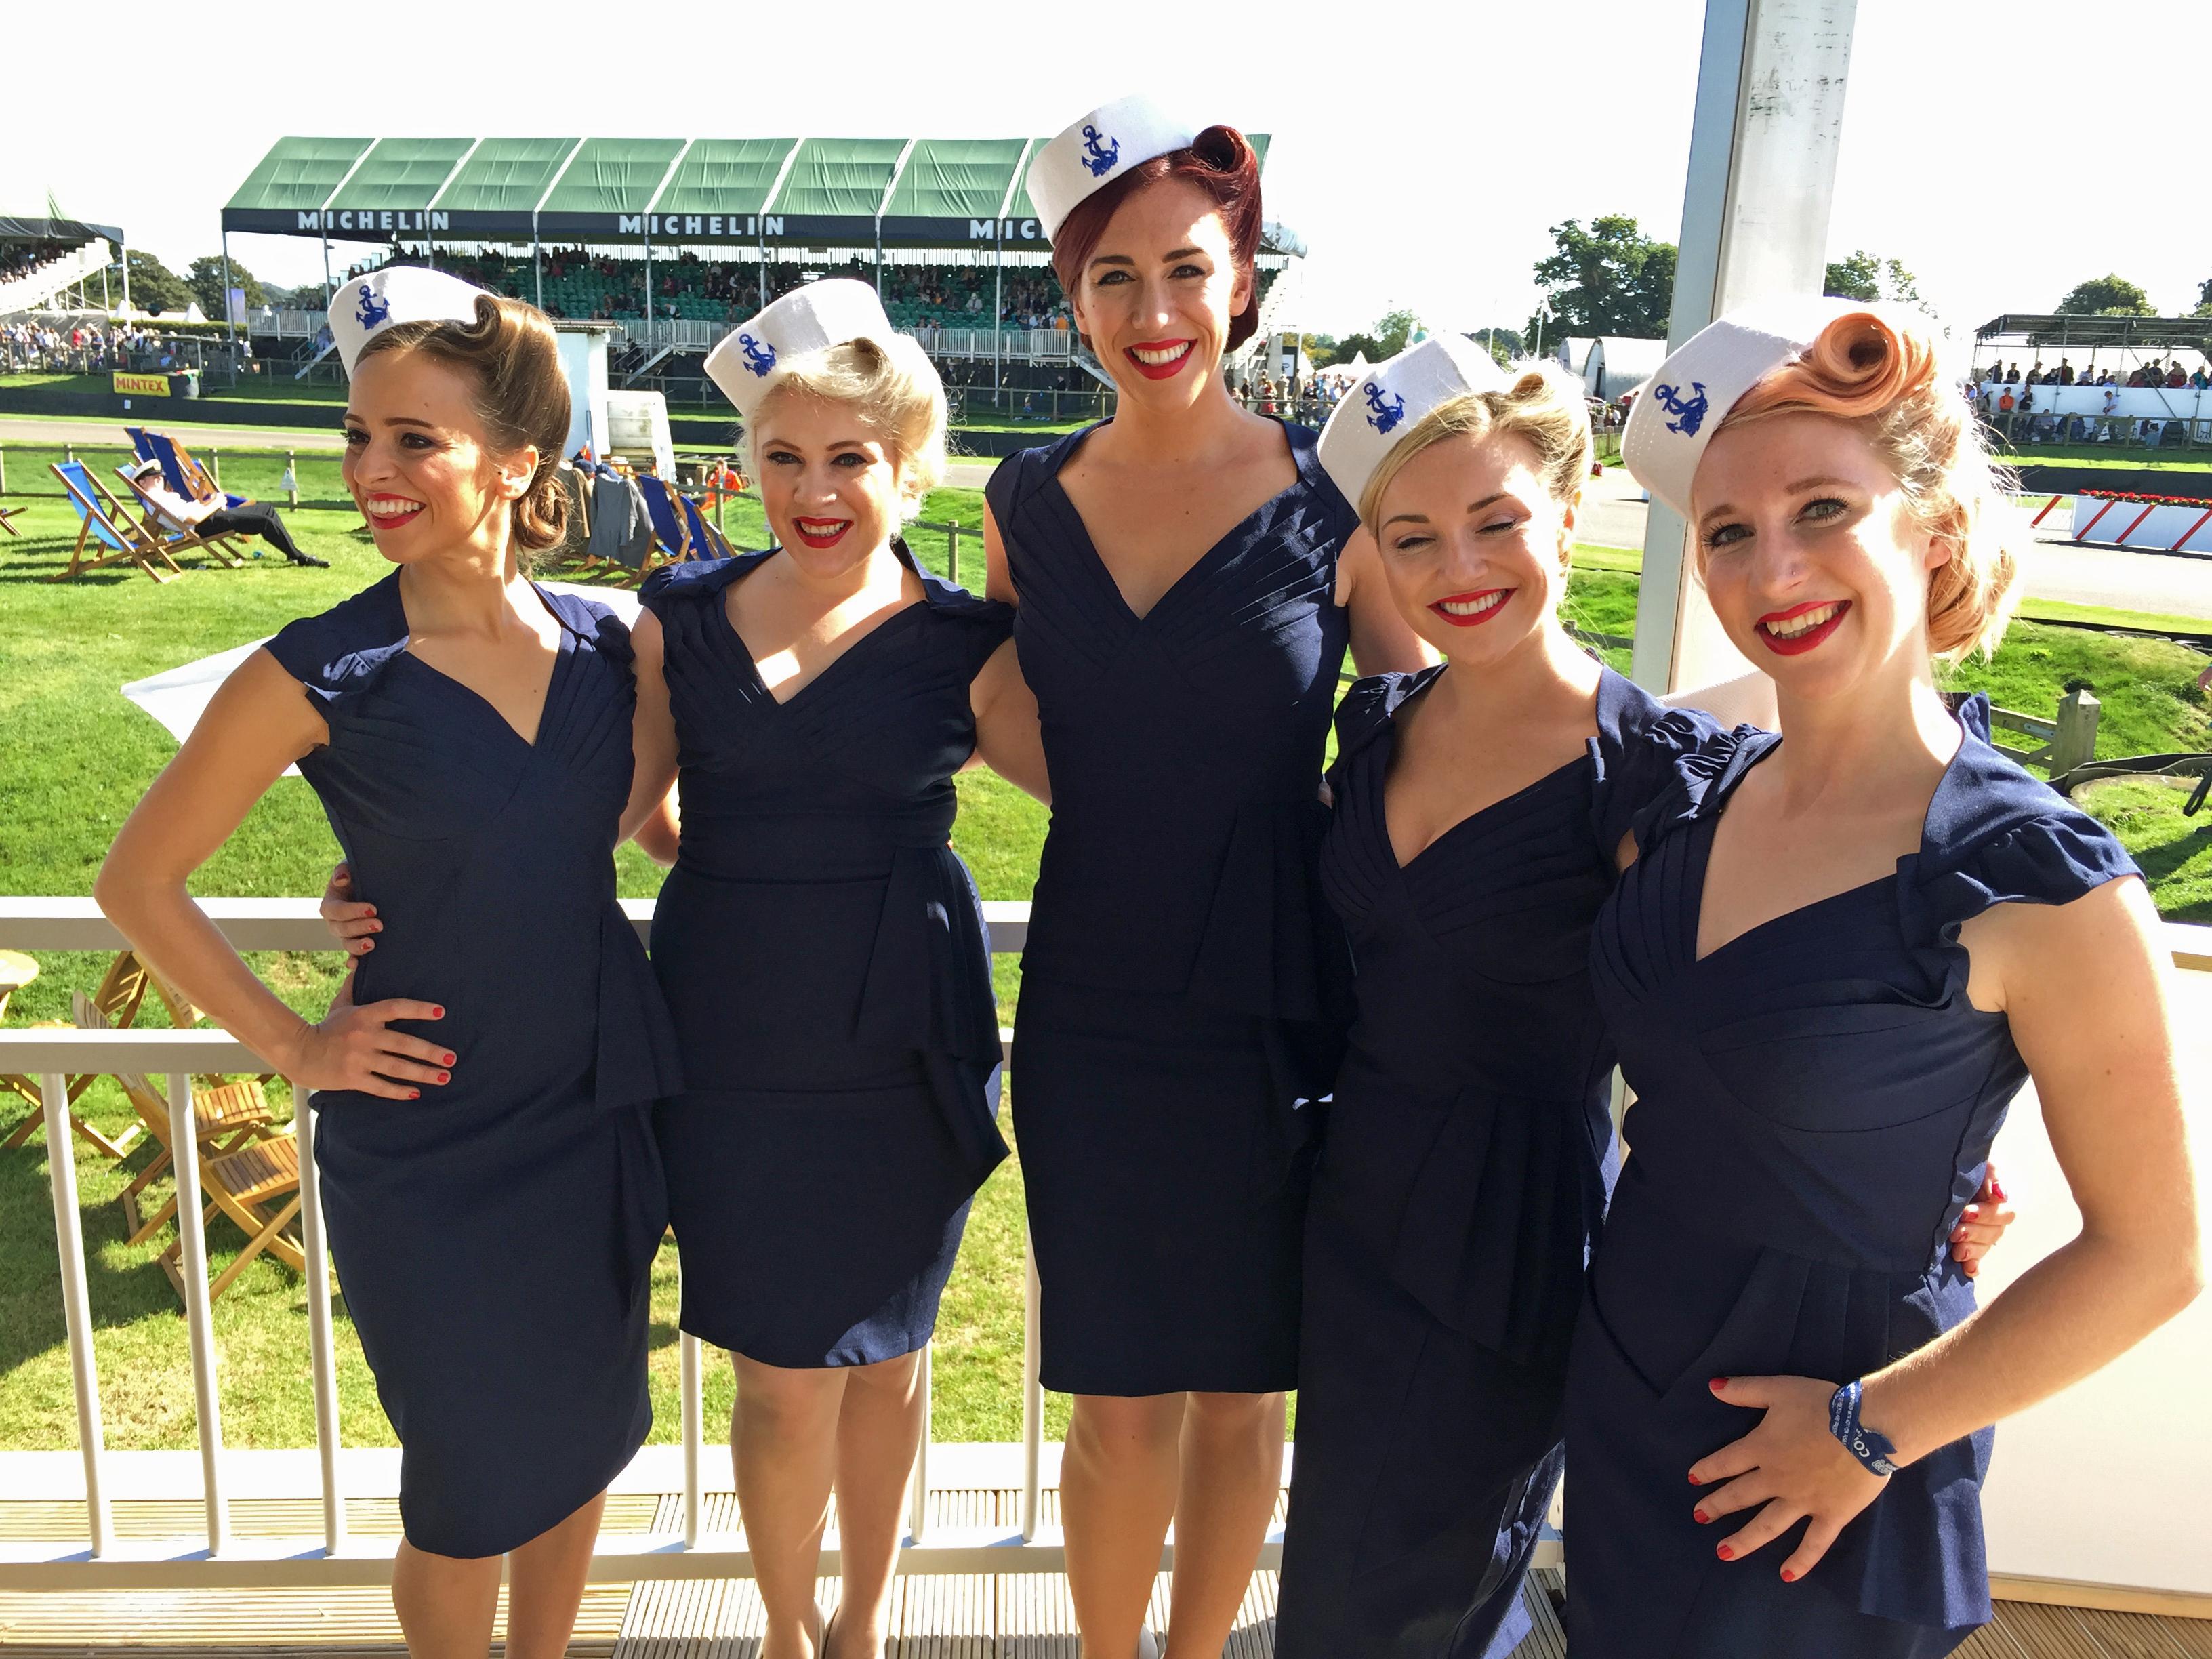 2016 Goodwood Revival Classic Ladies